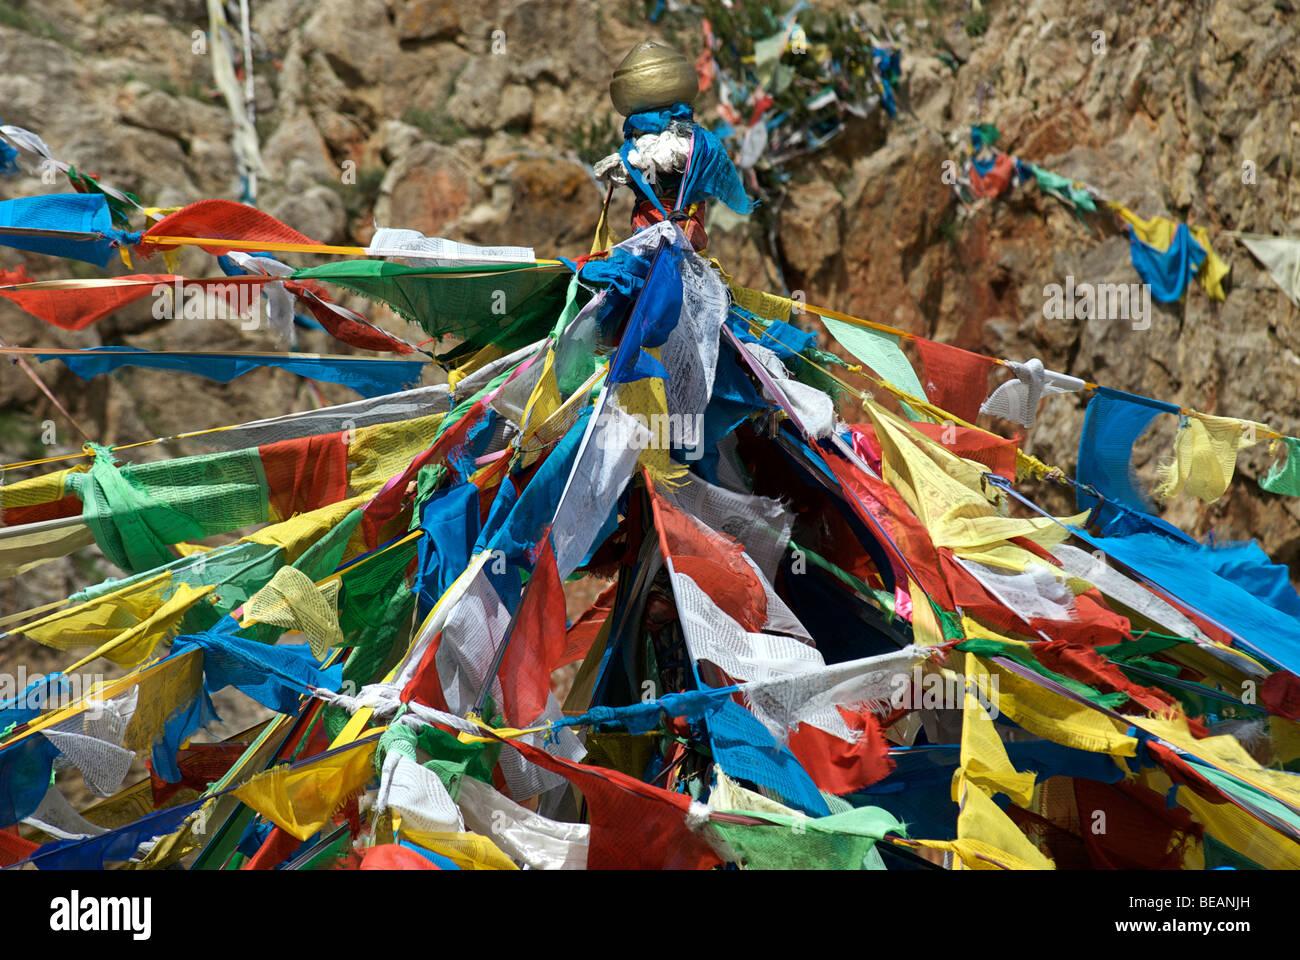 Prayerflags, Nam Tso Lake, Tibet - Stock Image